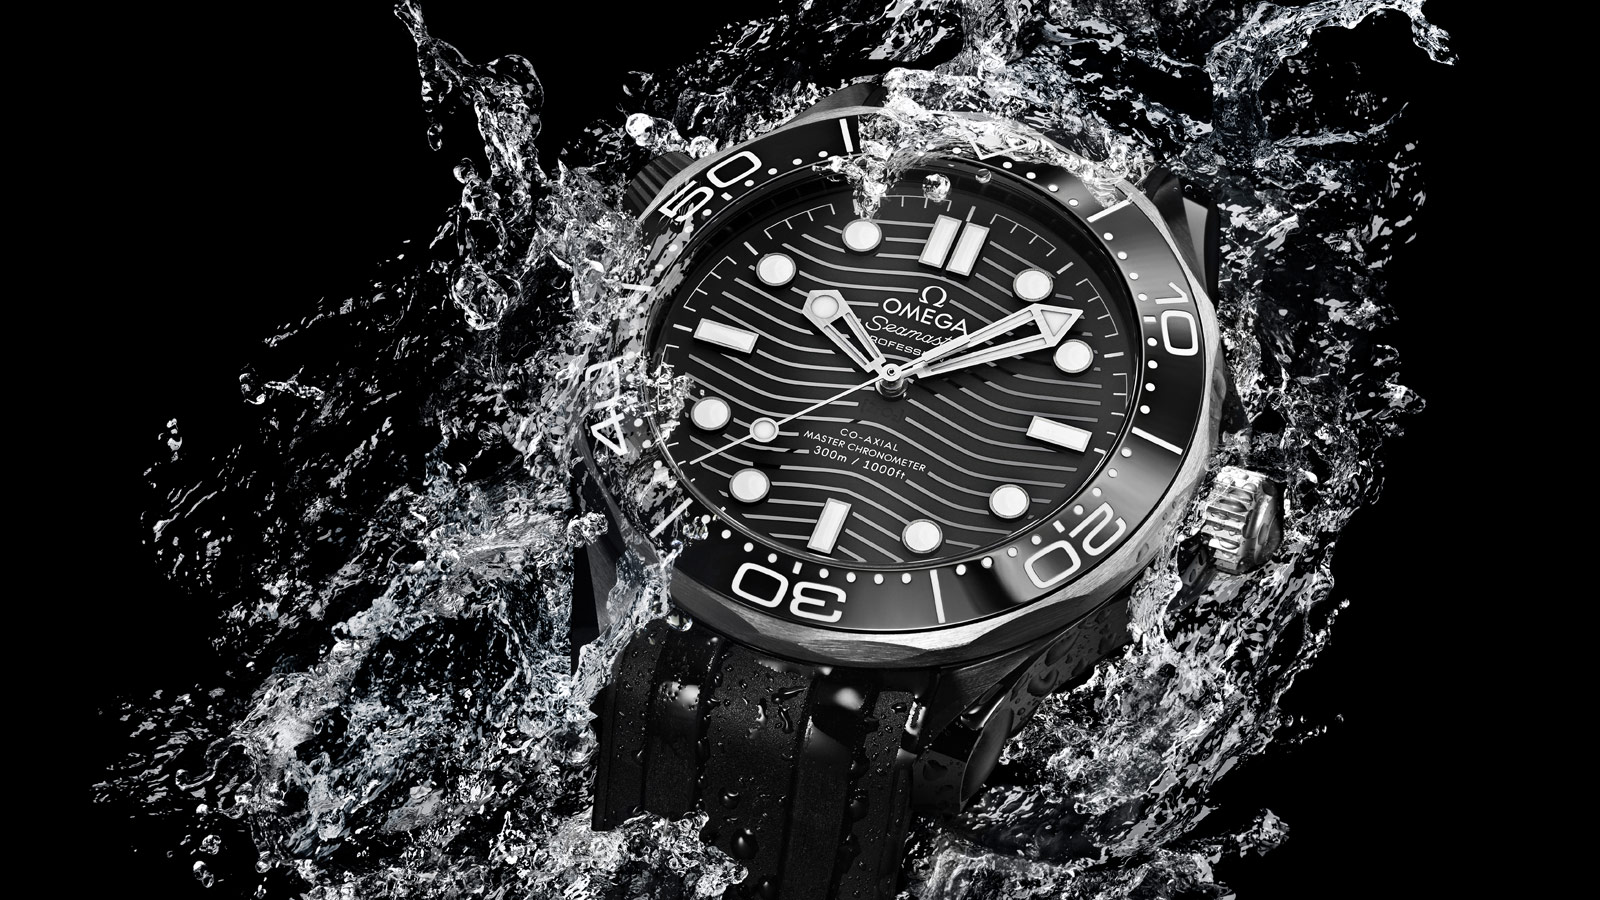 Seamaster 300米潜水表 300米潜水表 欧米茄至臻天文台表43.5毫米 腕表 - 210.92.44.20.01.001